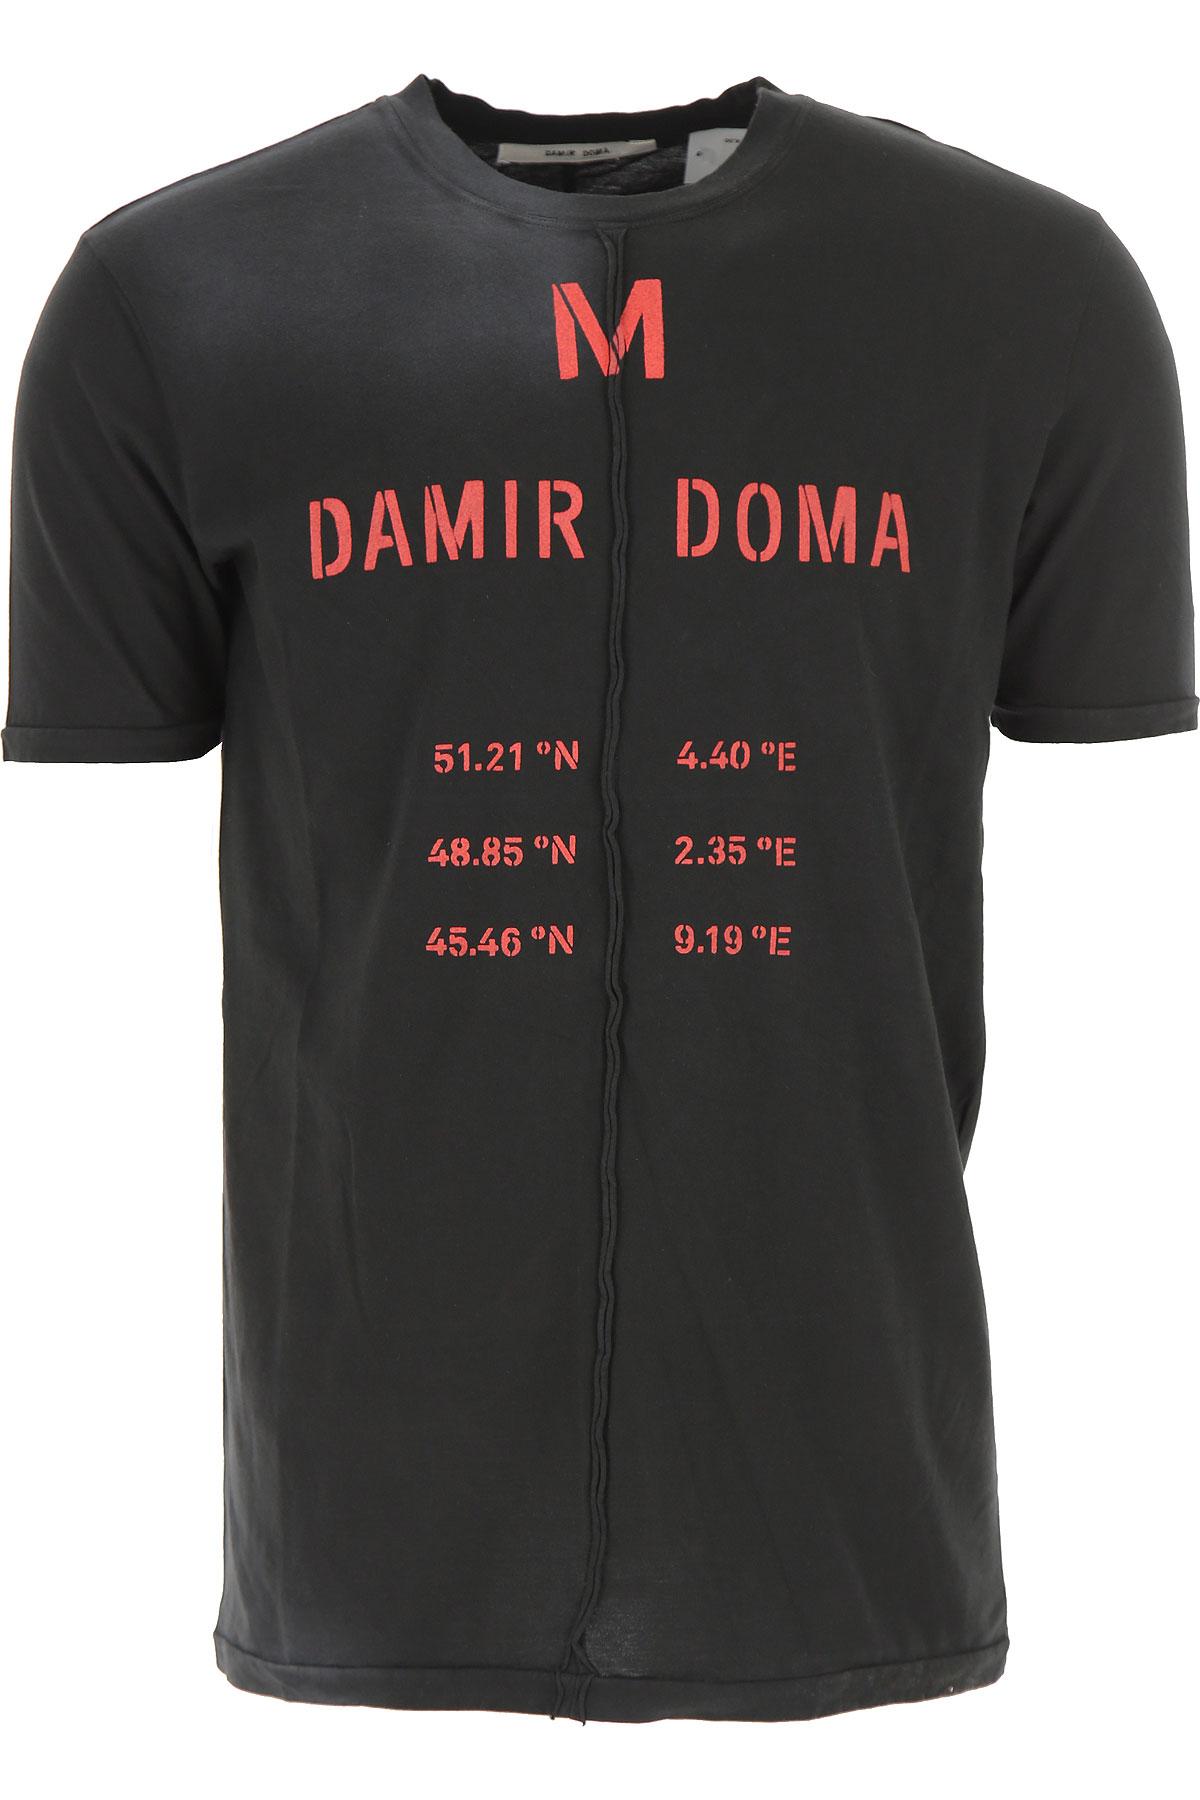 Image of Damir Doma T-Shirt for Men, Black, Cotton, 2017, L M S XL